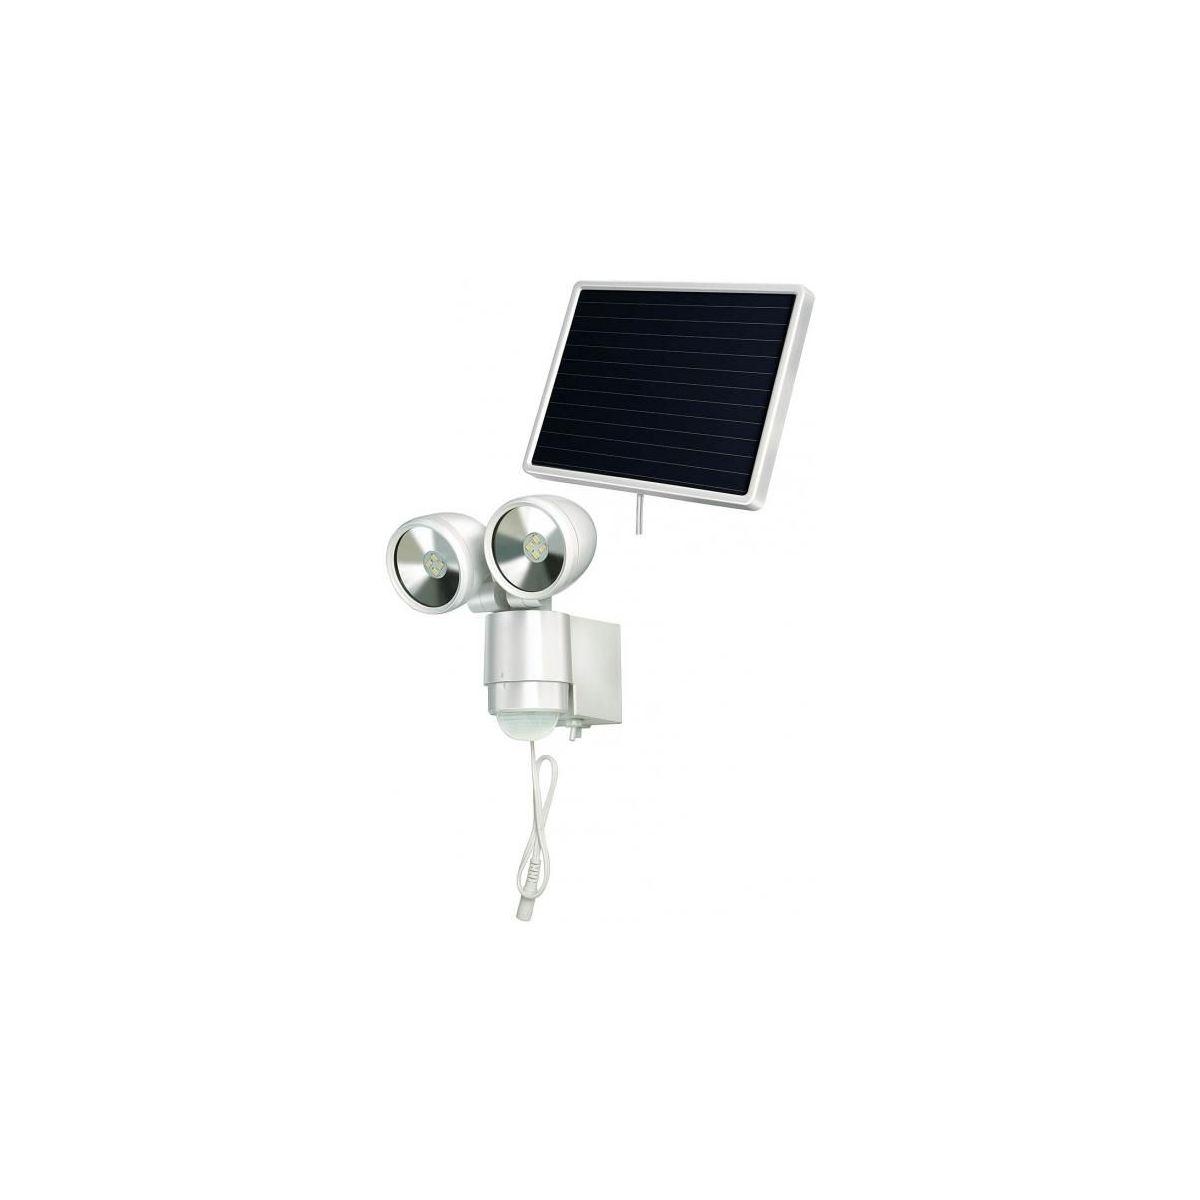 Noir Brennenstuhl Spot Solaire Lampe Outils 2x4 Ip44 fr Led rBostxChdQ